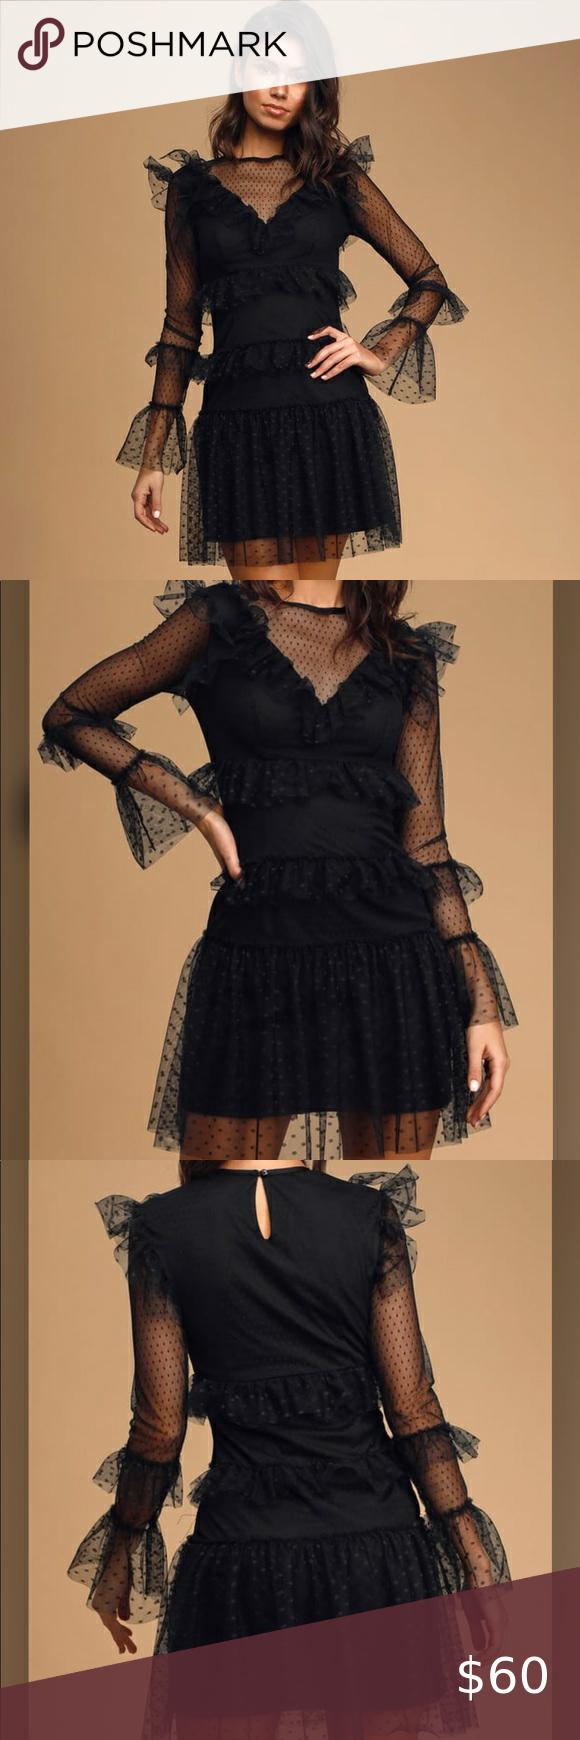 Black Swiss Dot Mesh Ruffled Mini Dress Sheer Mesh Overlay Swiss Dot Pattern Victorian Inspired Dress With A Rounded Neckli Inspired Dress Mini Dress Dresses [ 1740 x 580 Pixel ]